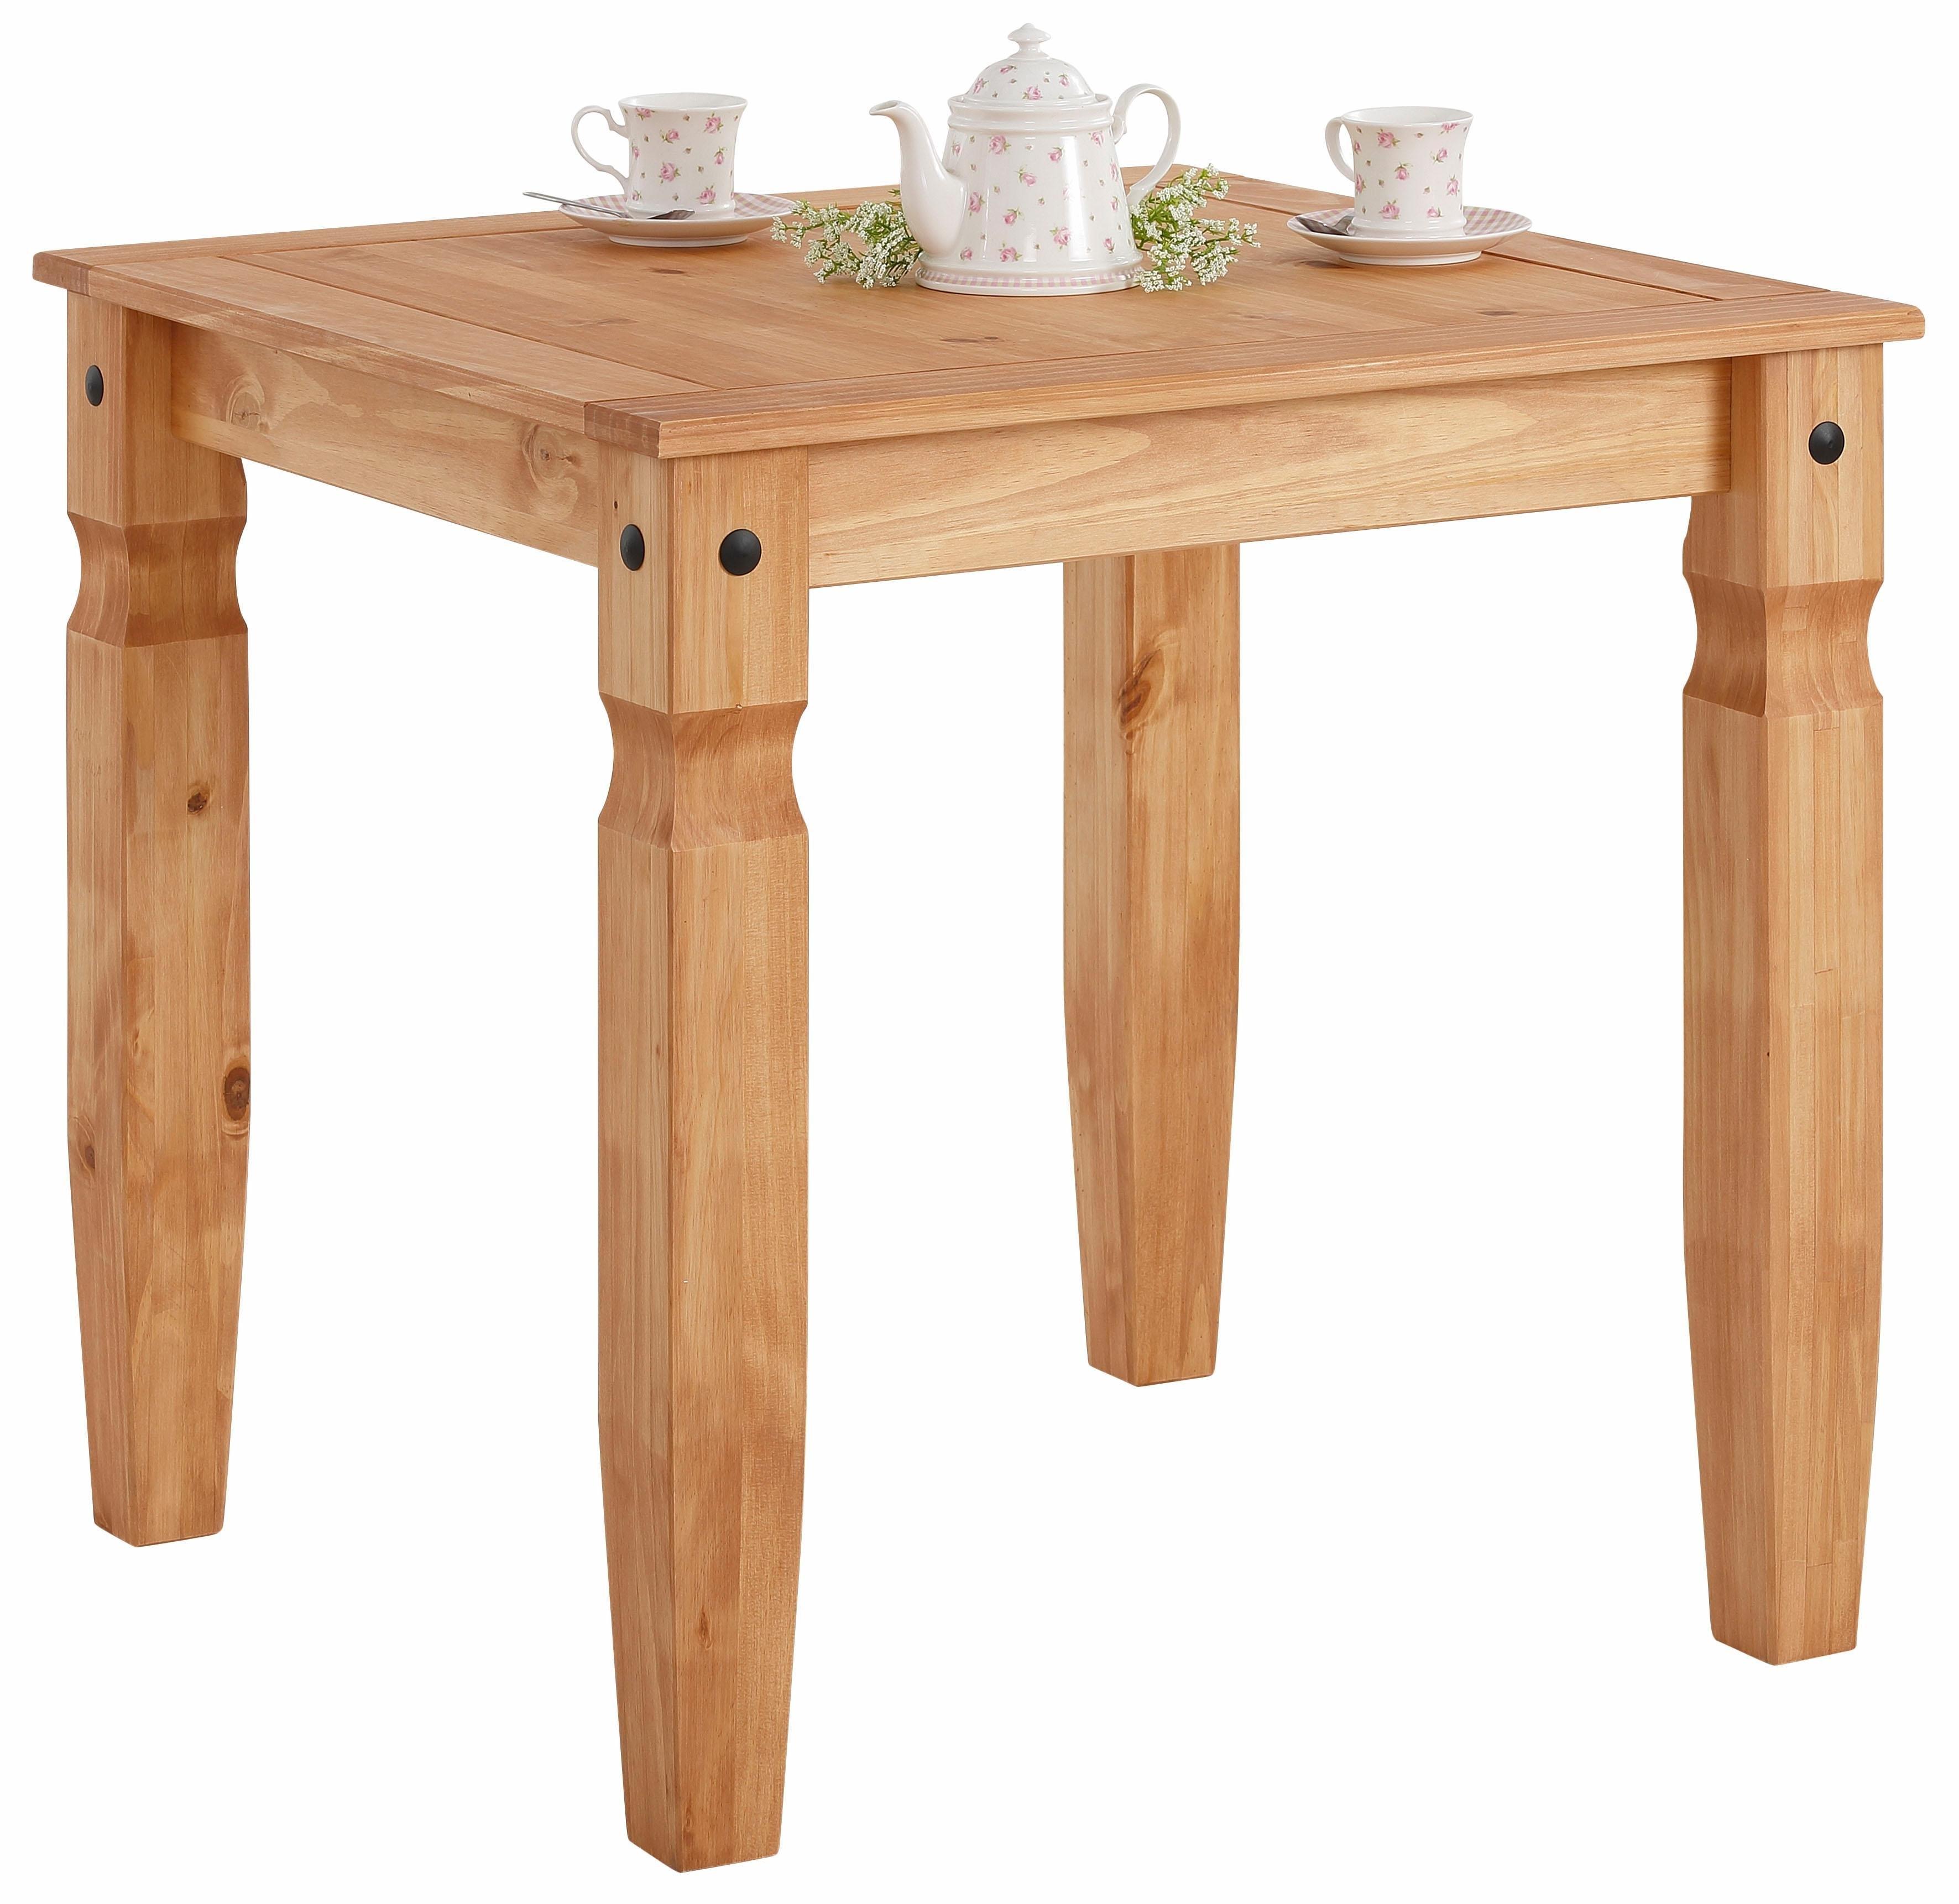 Vierkante Grenen Tafel.Eettafel